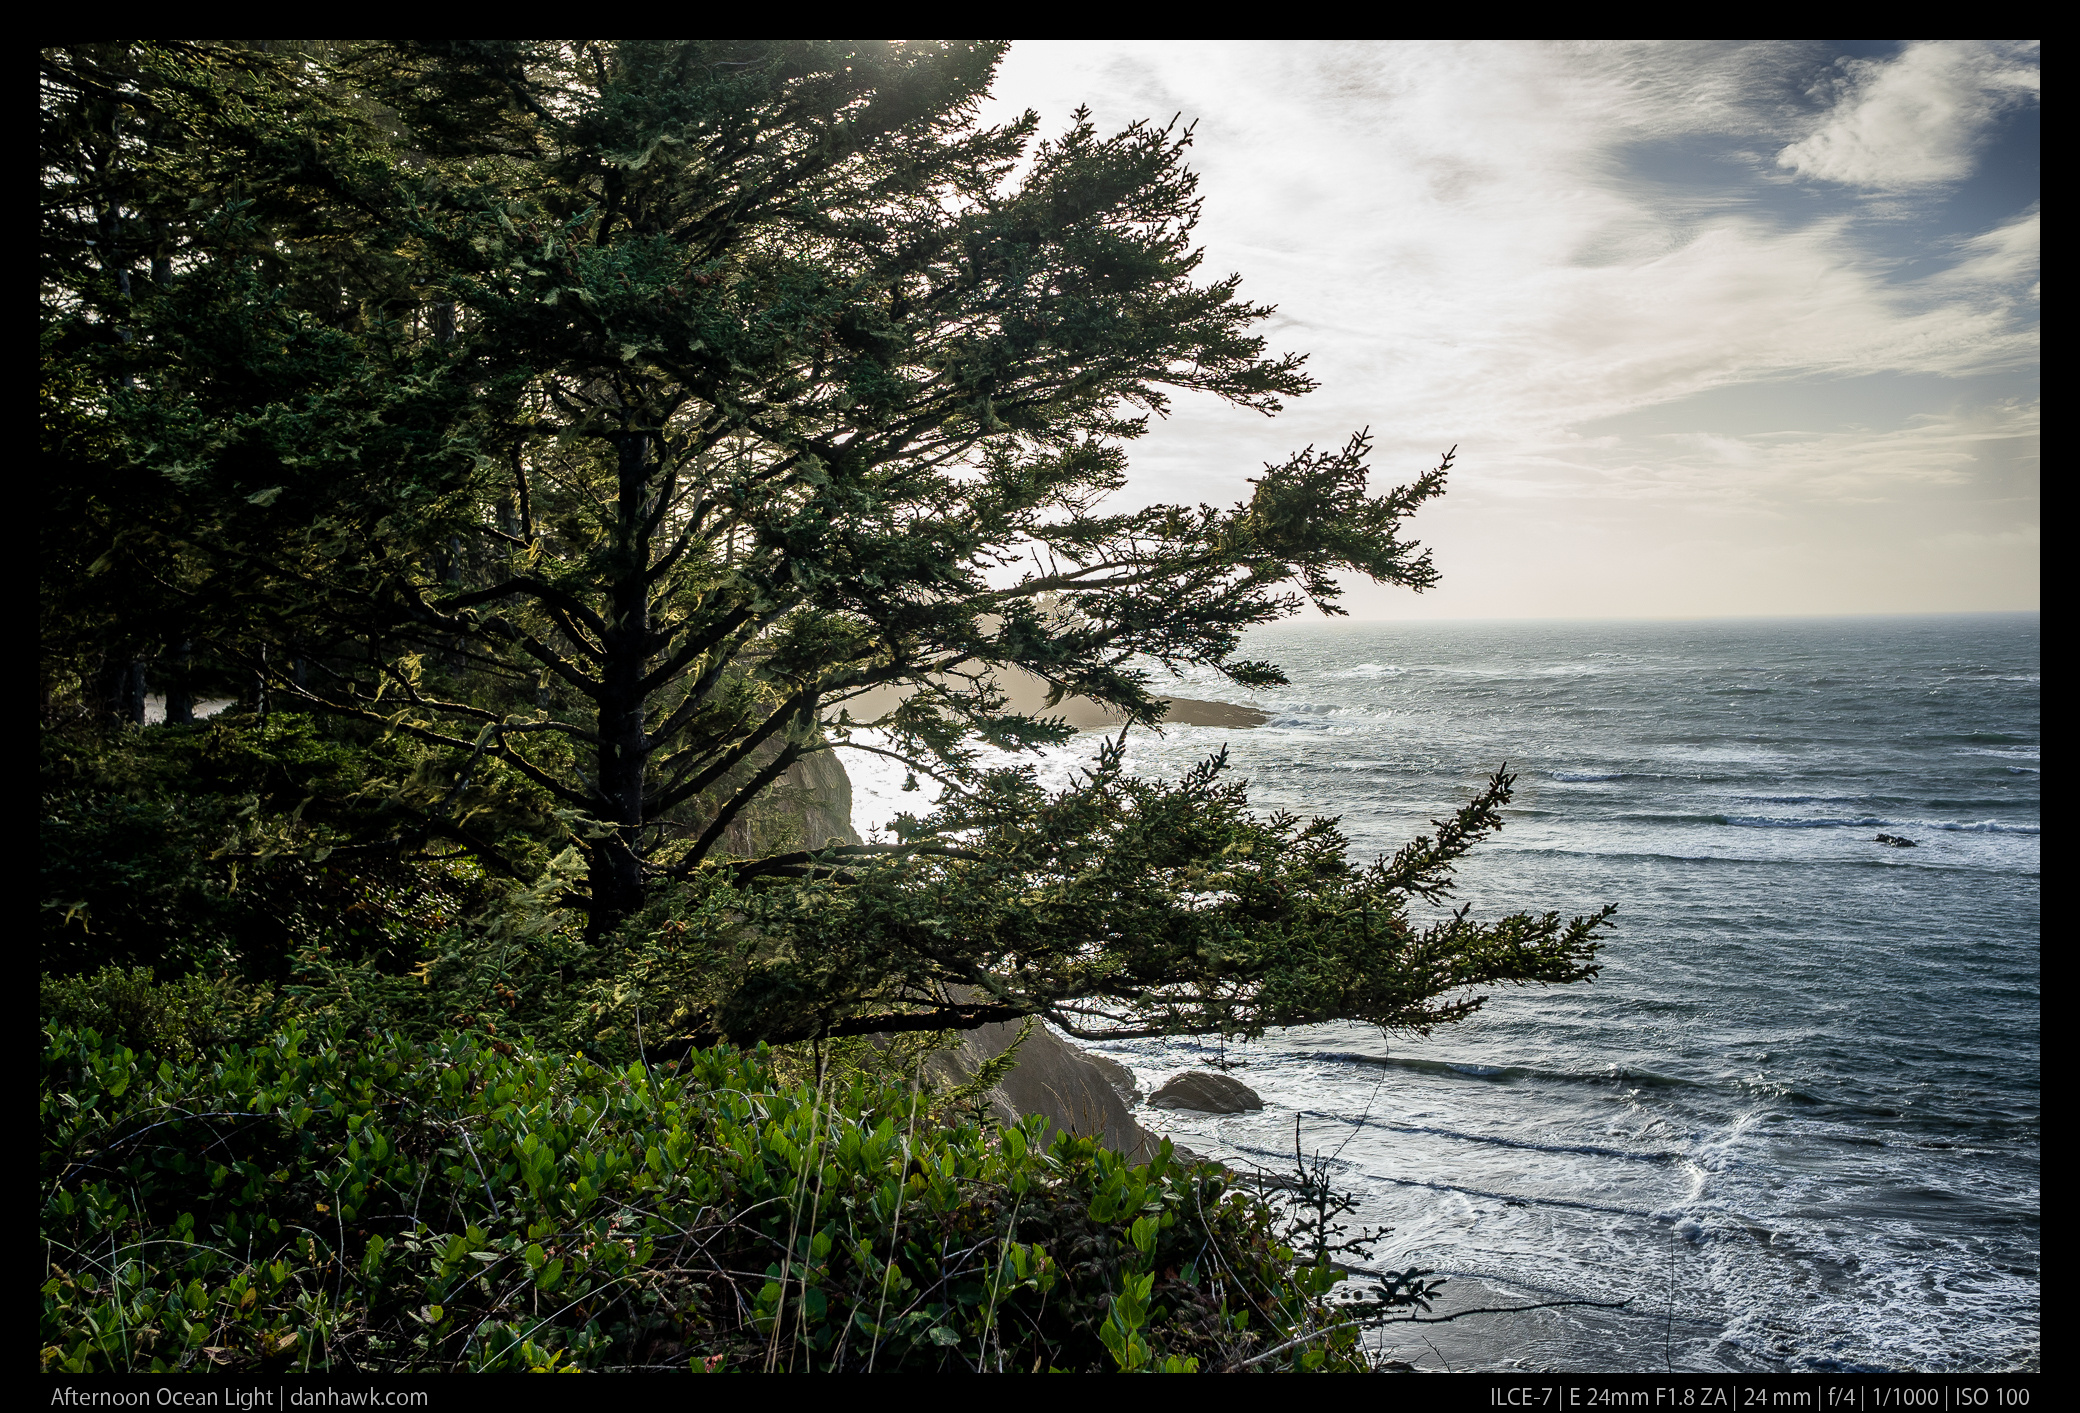 Afternoon Ocean Light